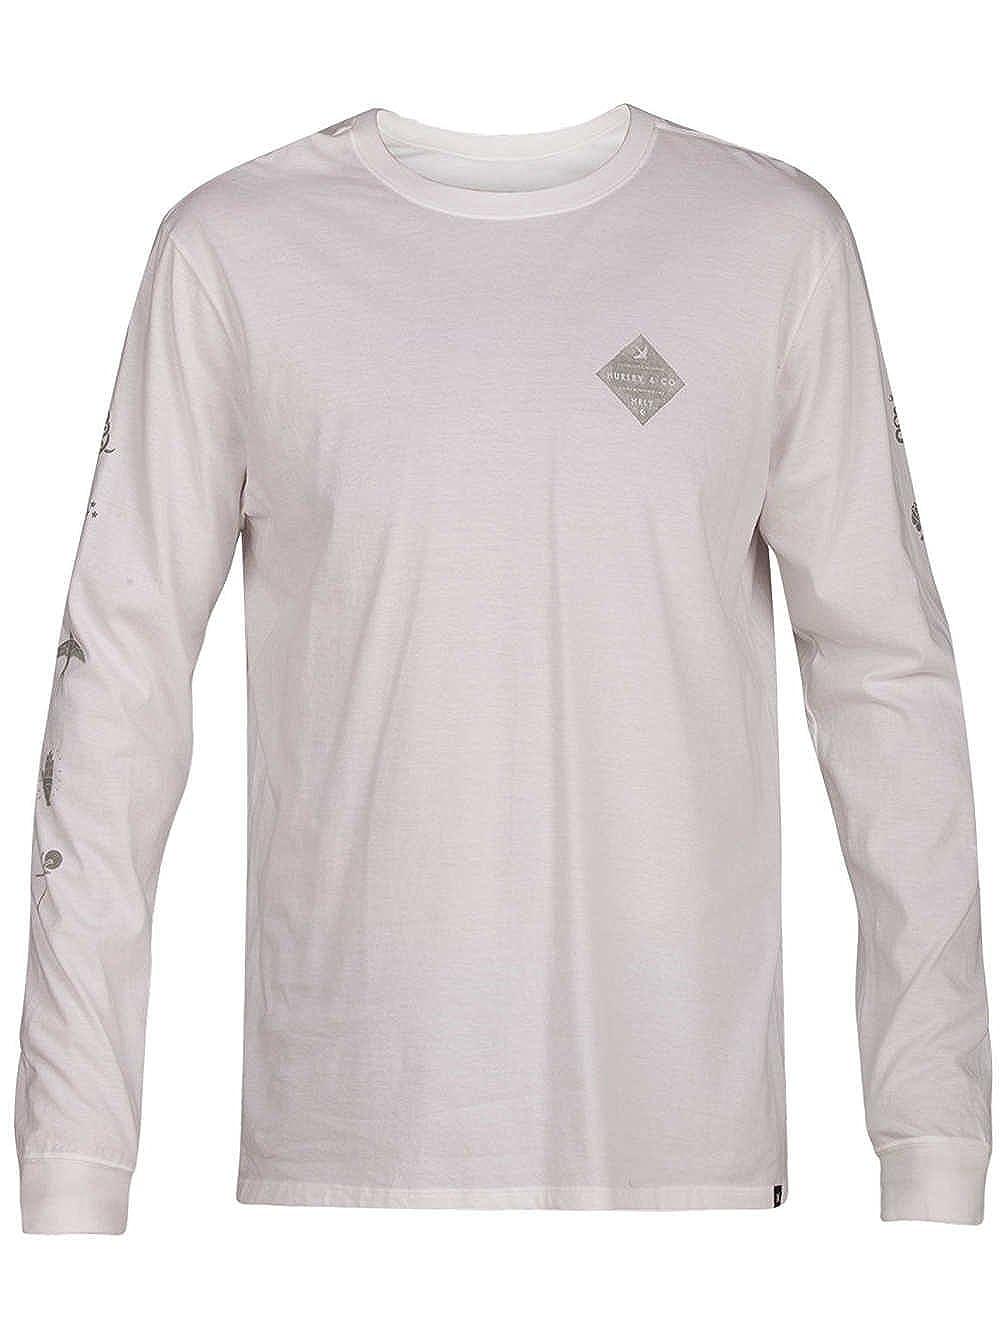 Hurley AA5331 Men's Glyphs Long Sleeve T-Shirt